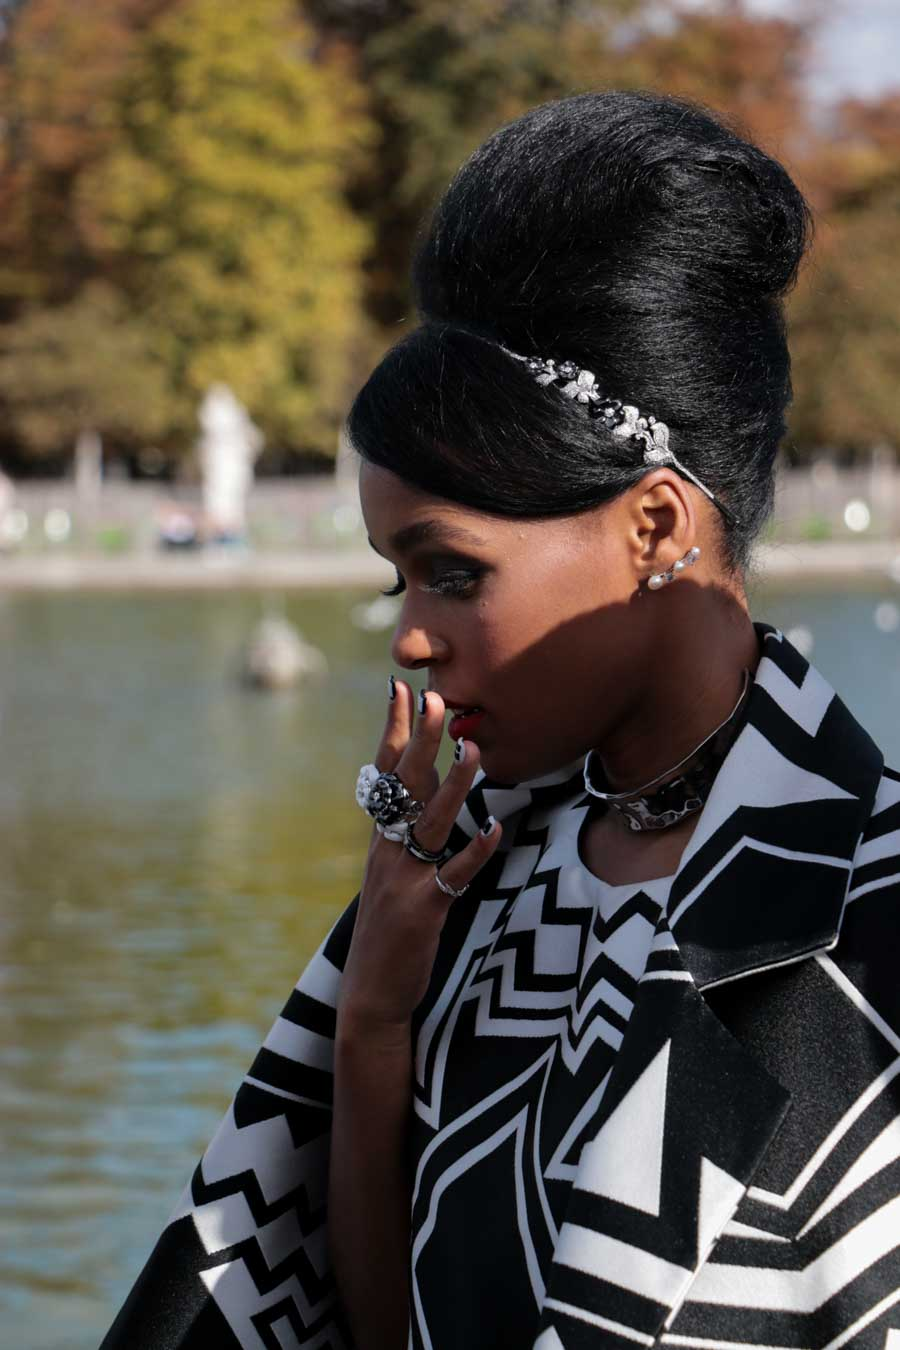 janell_monae_hair_paris_fashion_week-10